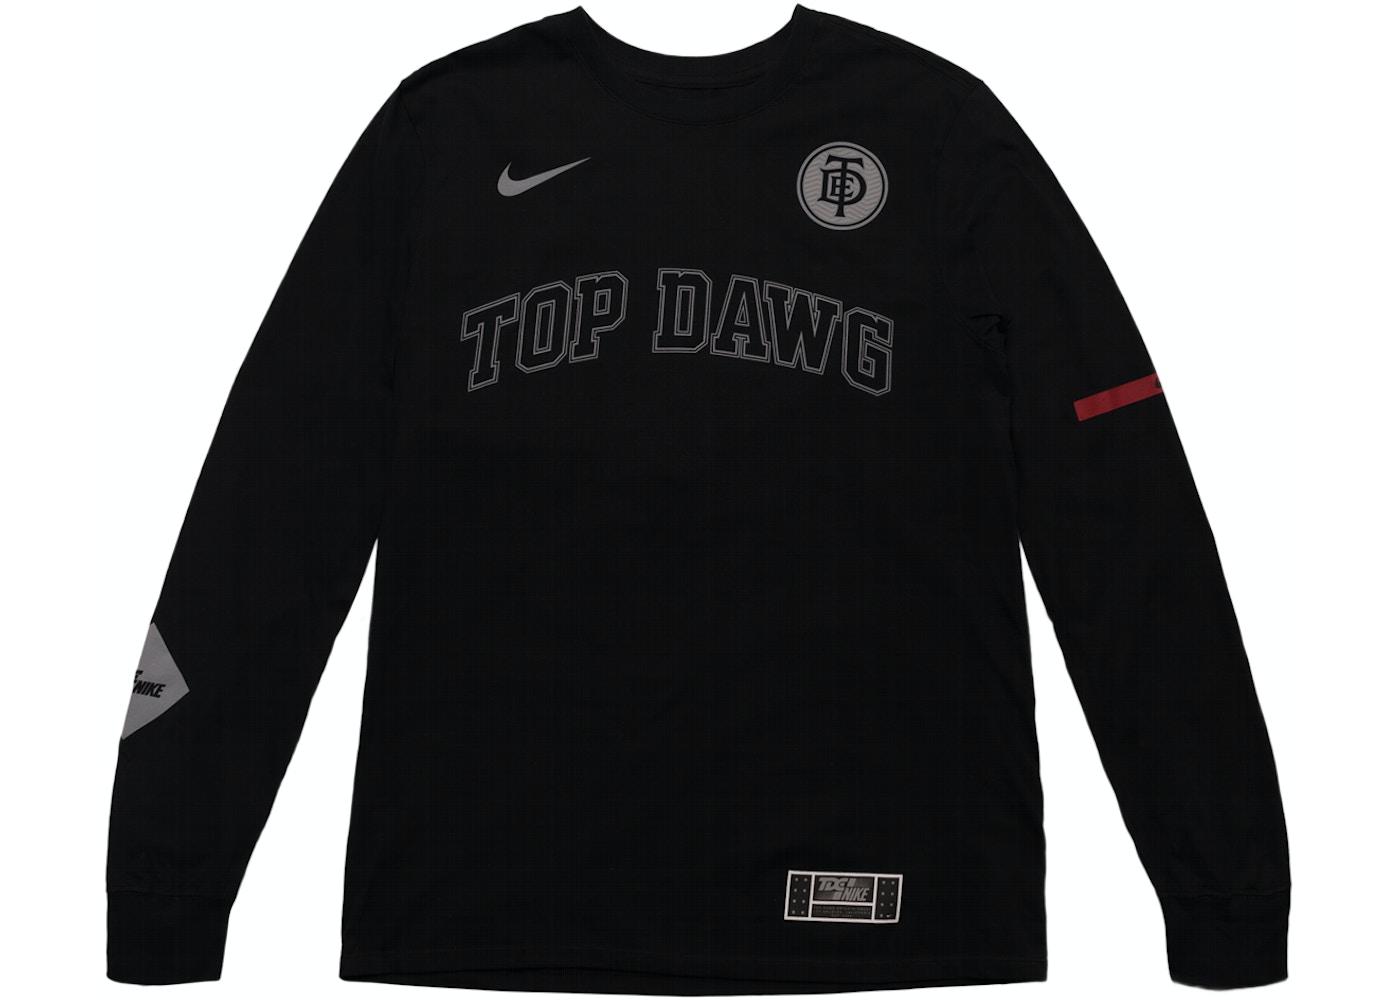 41ea17fe TDE x Nike Top Dawg Arc Long Sleeve TDE Black - SS18